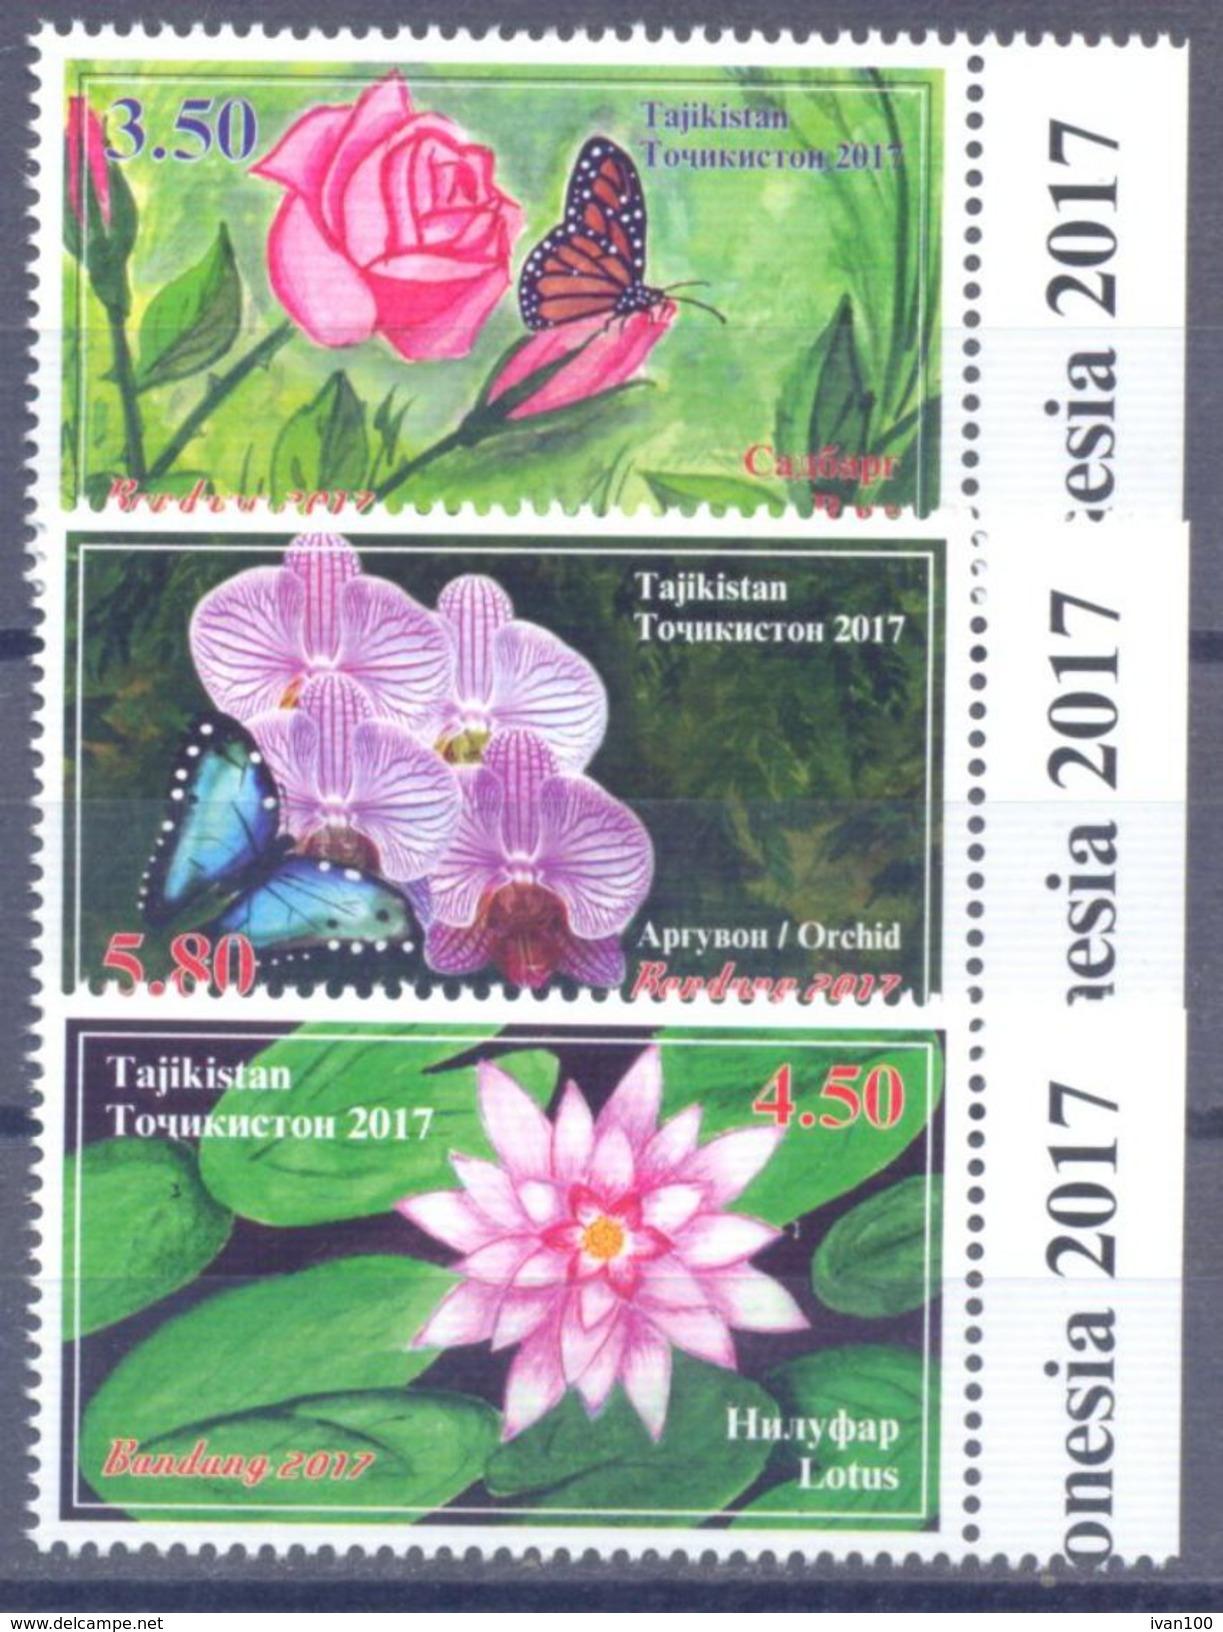 2017. Tajikistan, Flowers & Insects, International Philatelic Exhibition, 3v Perforated, Mint/** - Tadschikistan